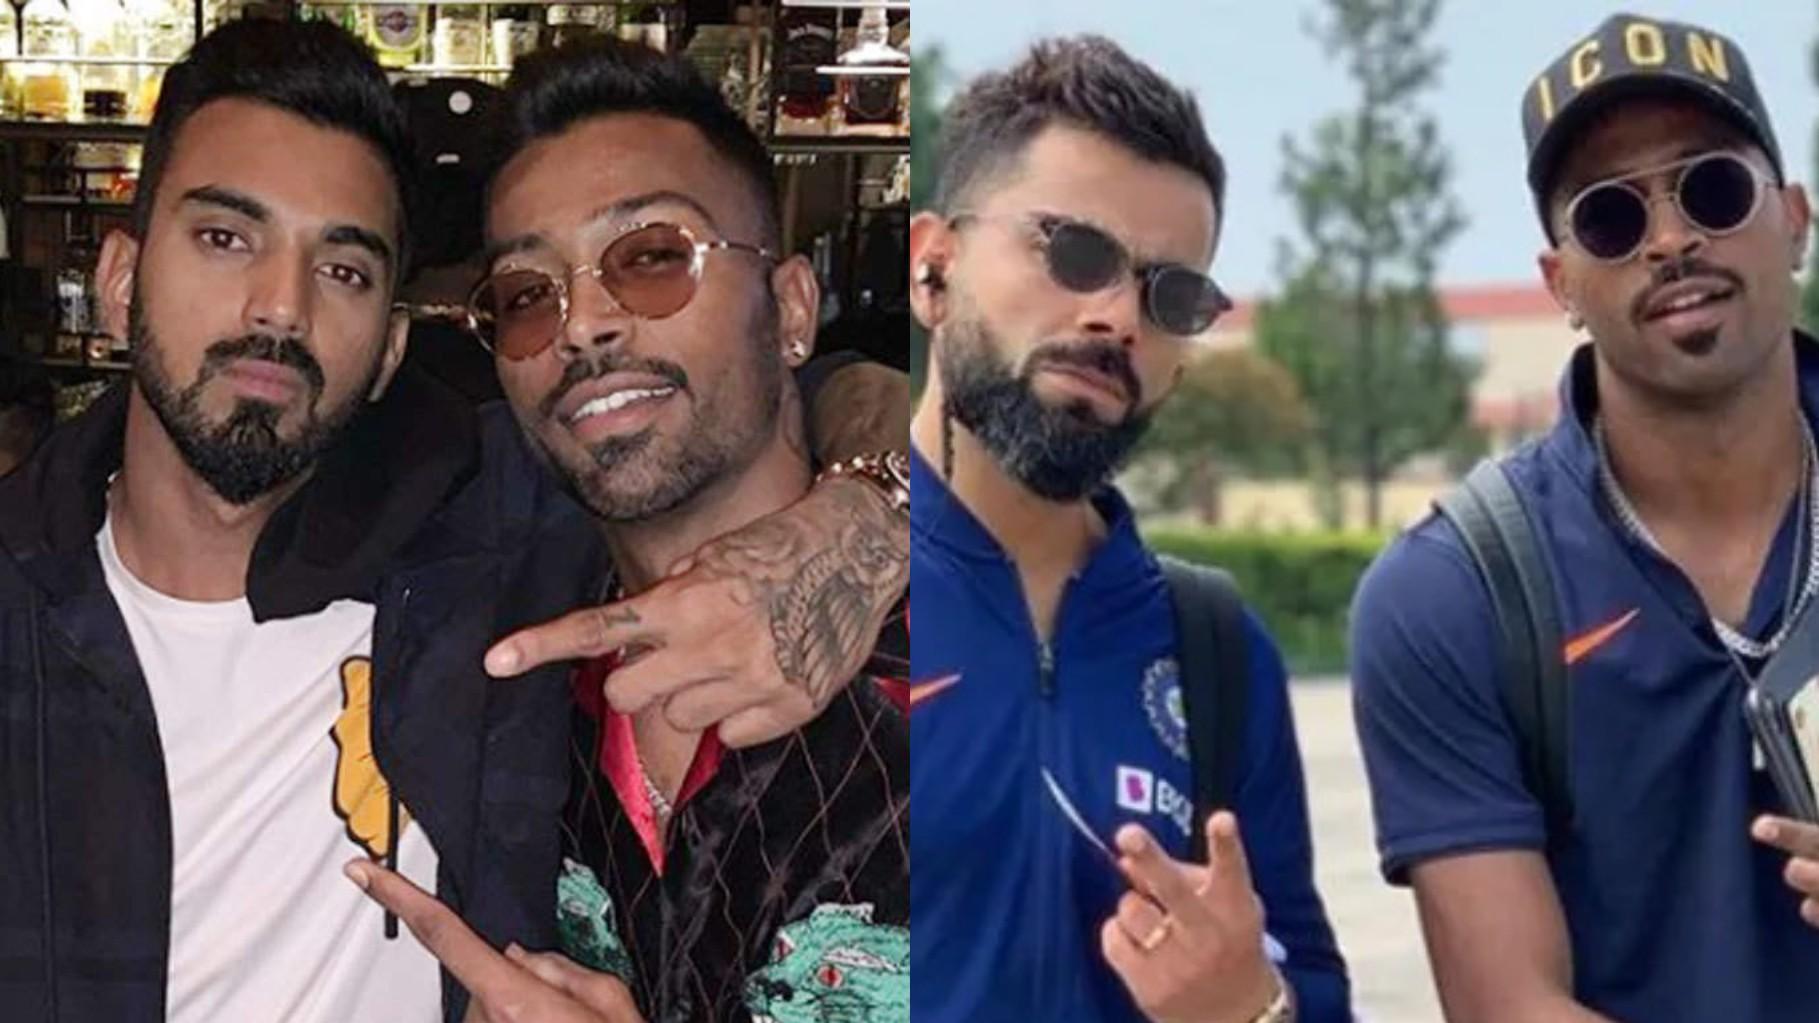 Team India members send wishes to Hardik Pandya on his 27th birthday